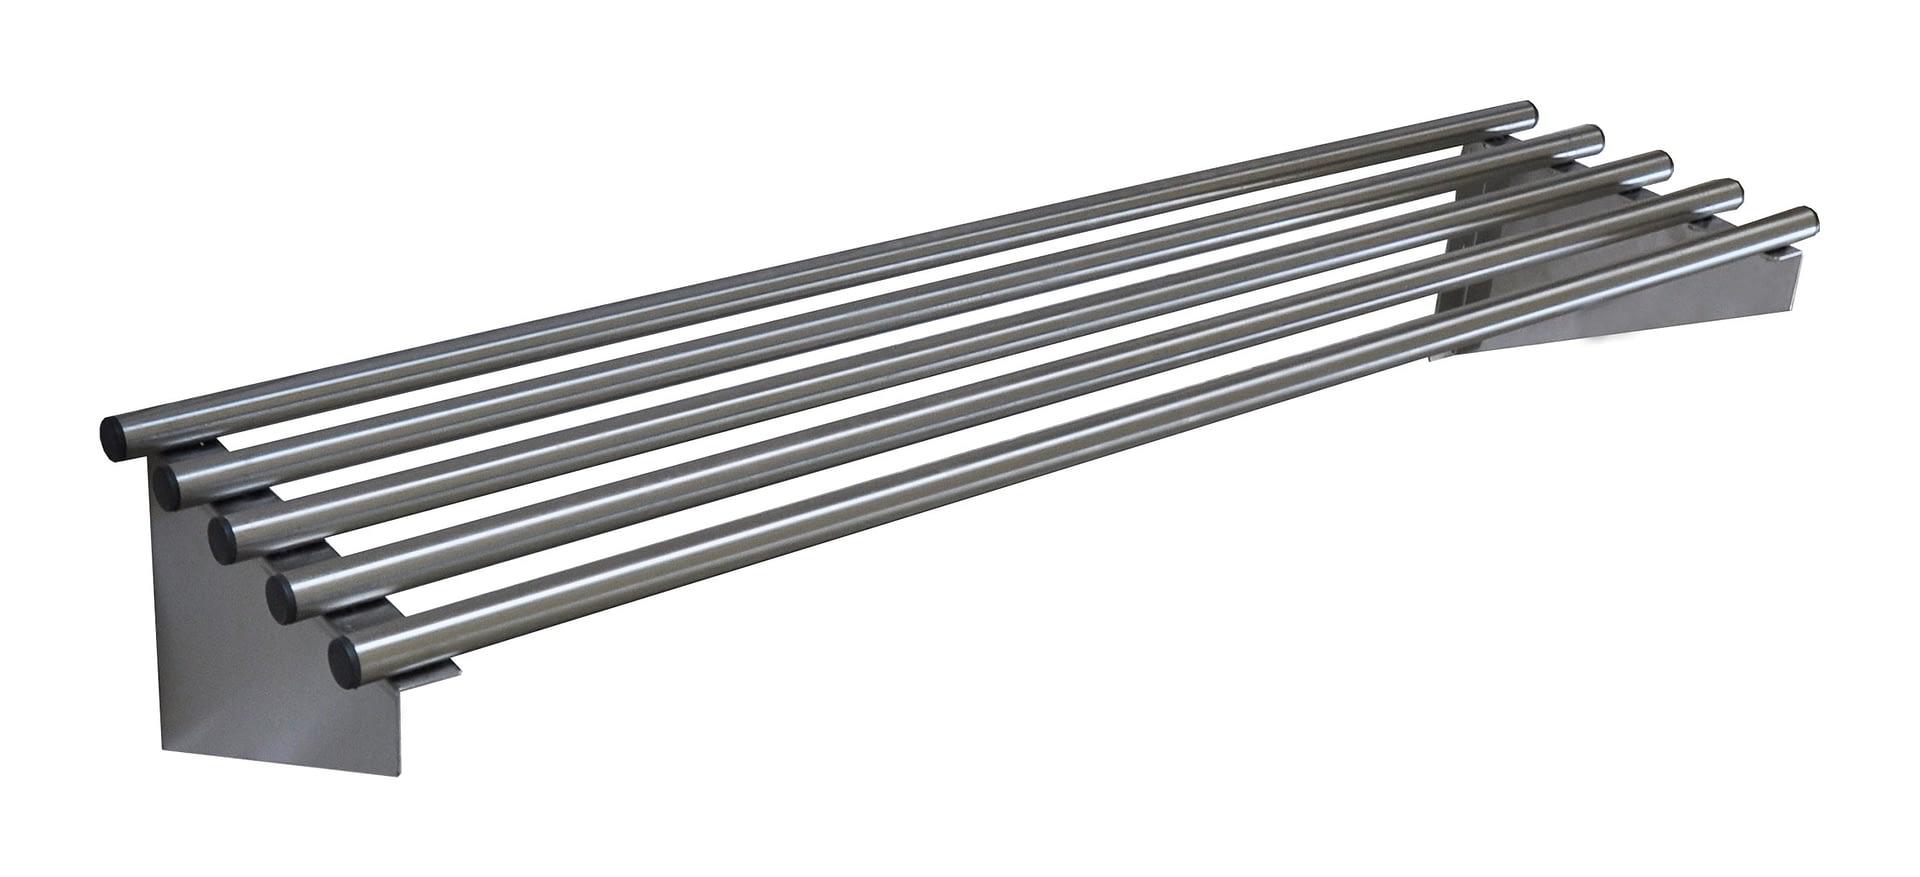 Stainless Steel Pipe Wall Shelf, 1200 X 300mm deep